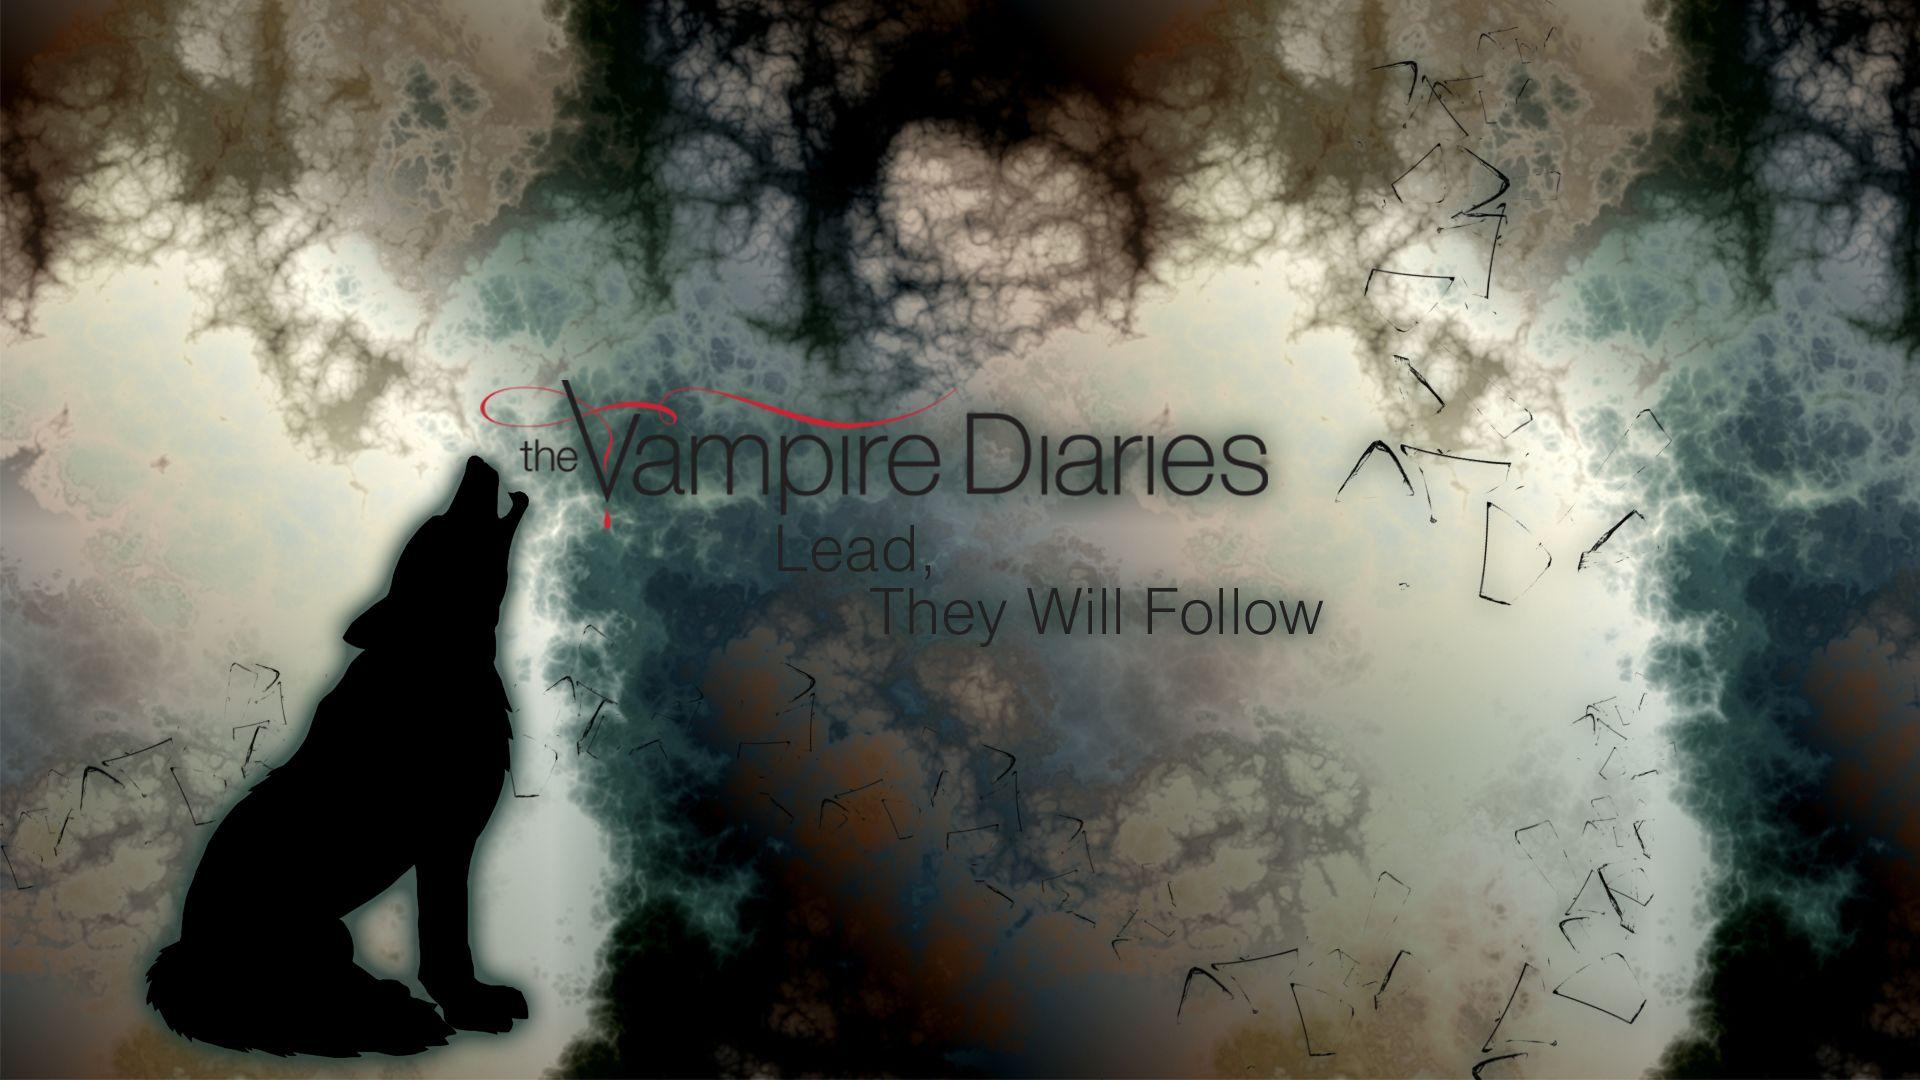 Lockwoods By Saurabhwahile Deviantart Com On Deviantart Vampire Diaries Wallpaper Vampire Diaries Vampire